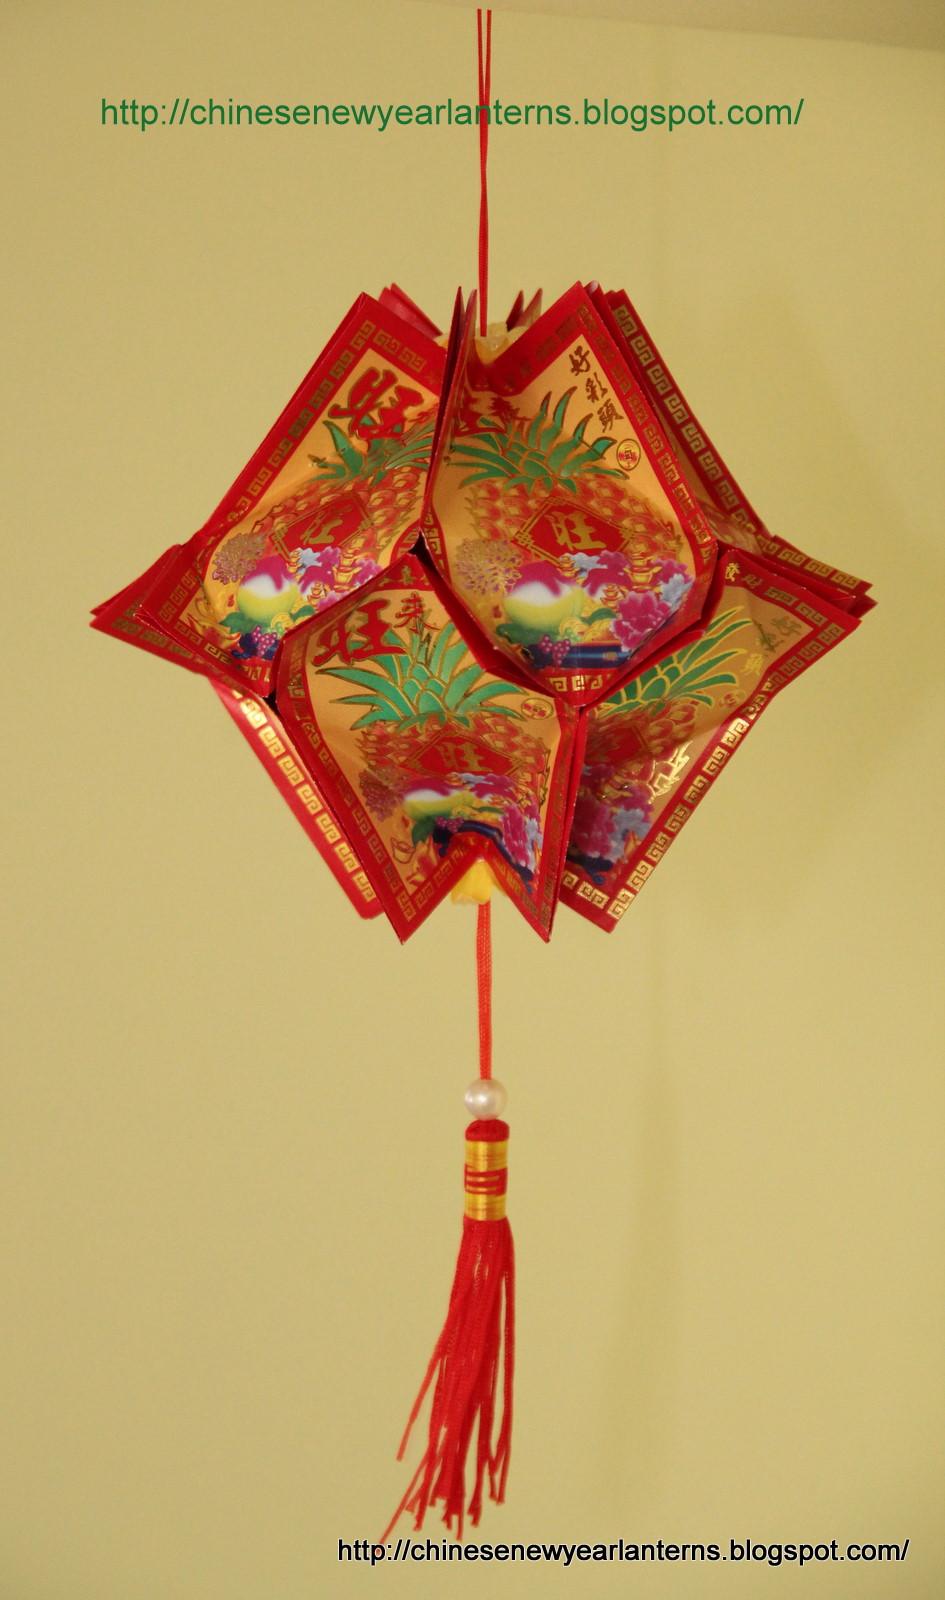 Chinese New Year Lanterns 红包灯笼手工制作: January 2012